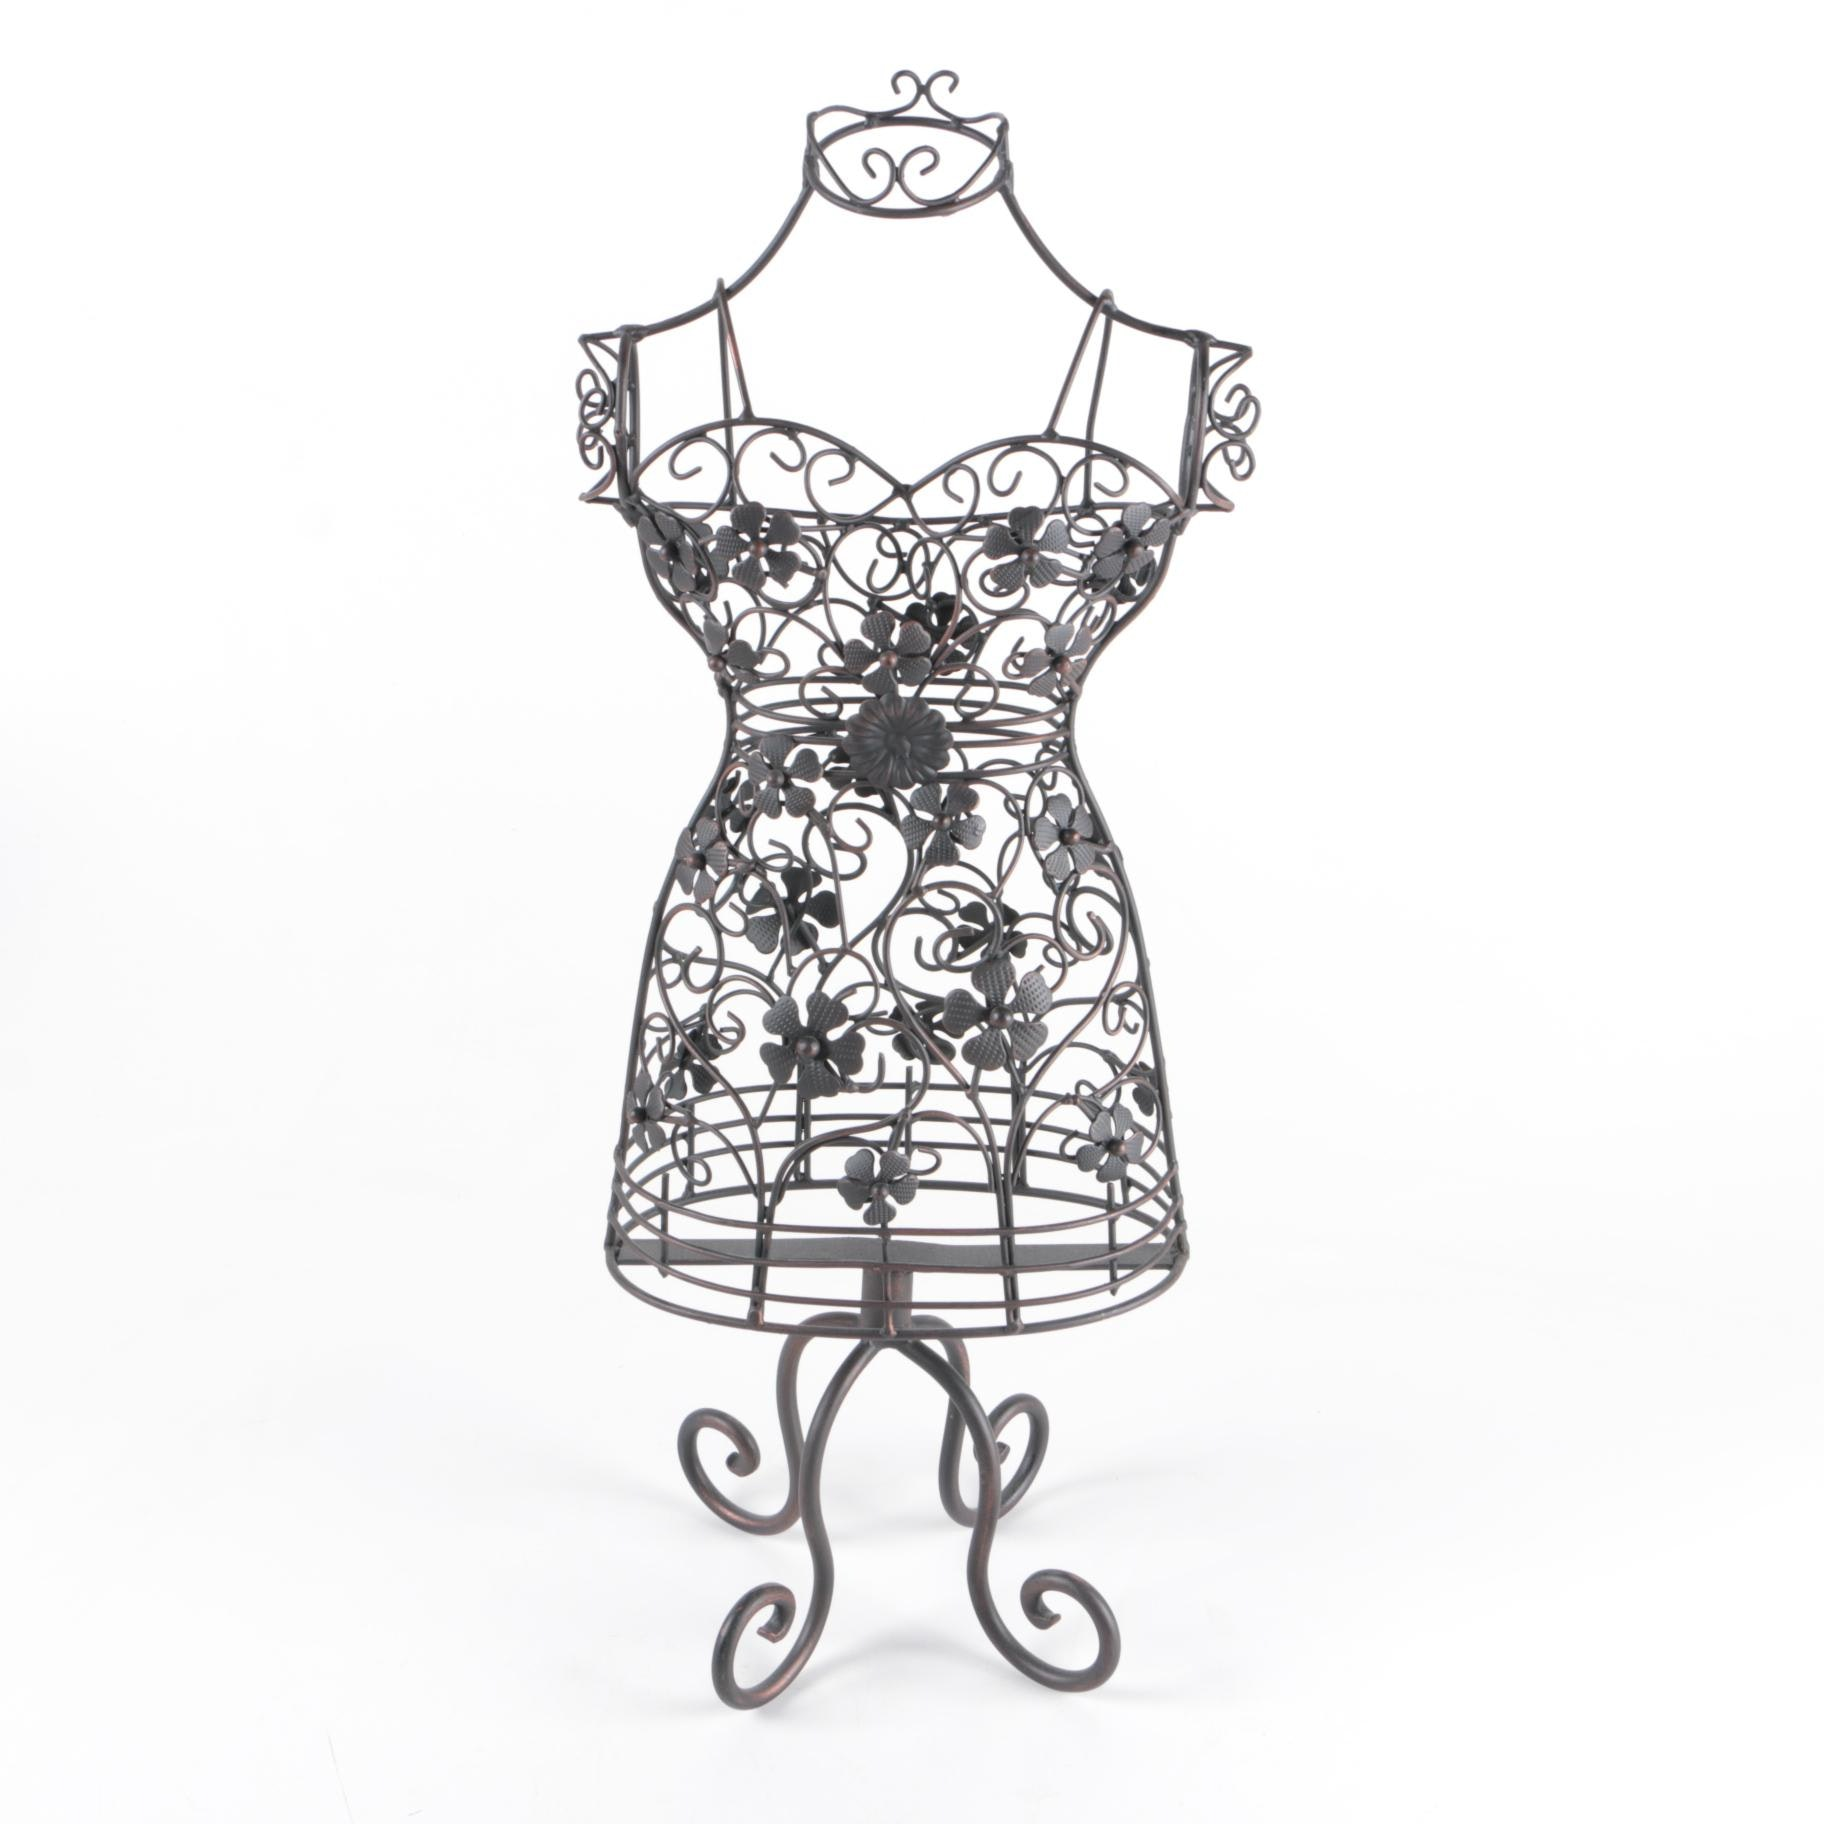 Black Metal Decorative Dress Form Mannequin